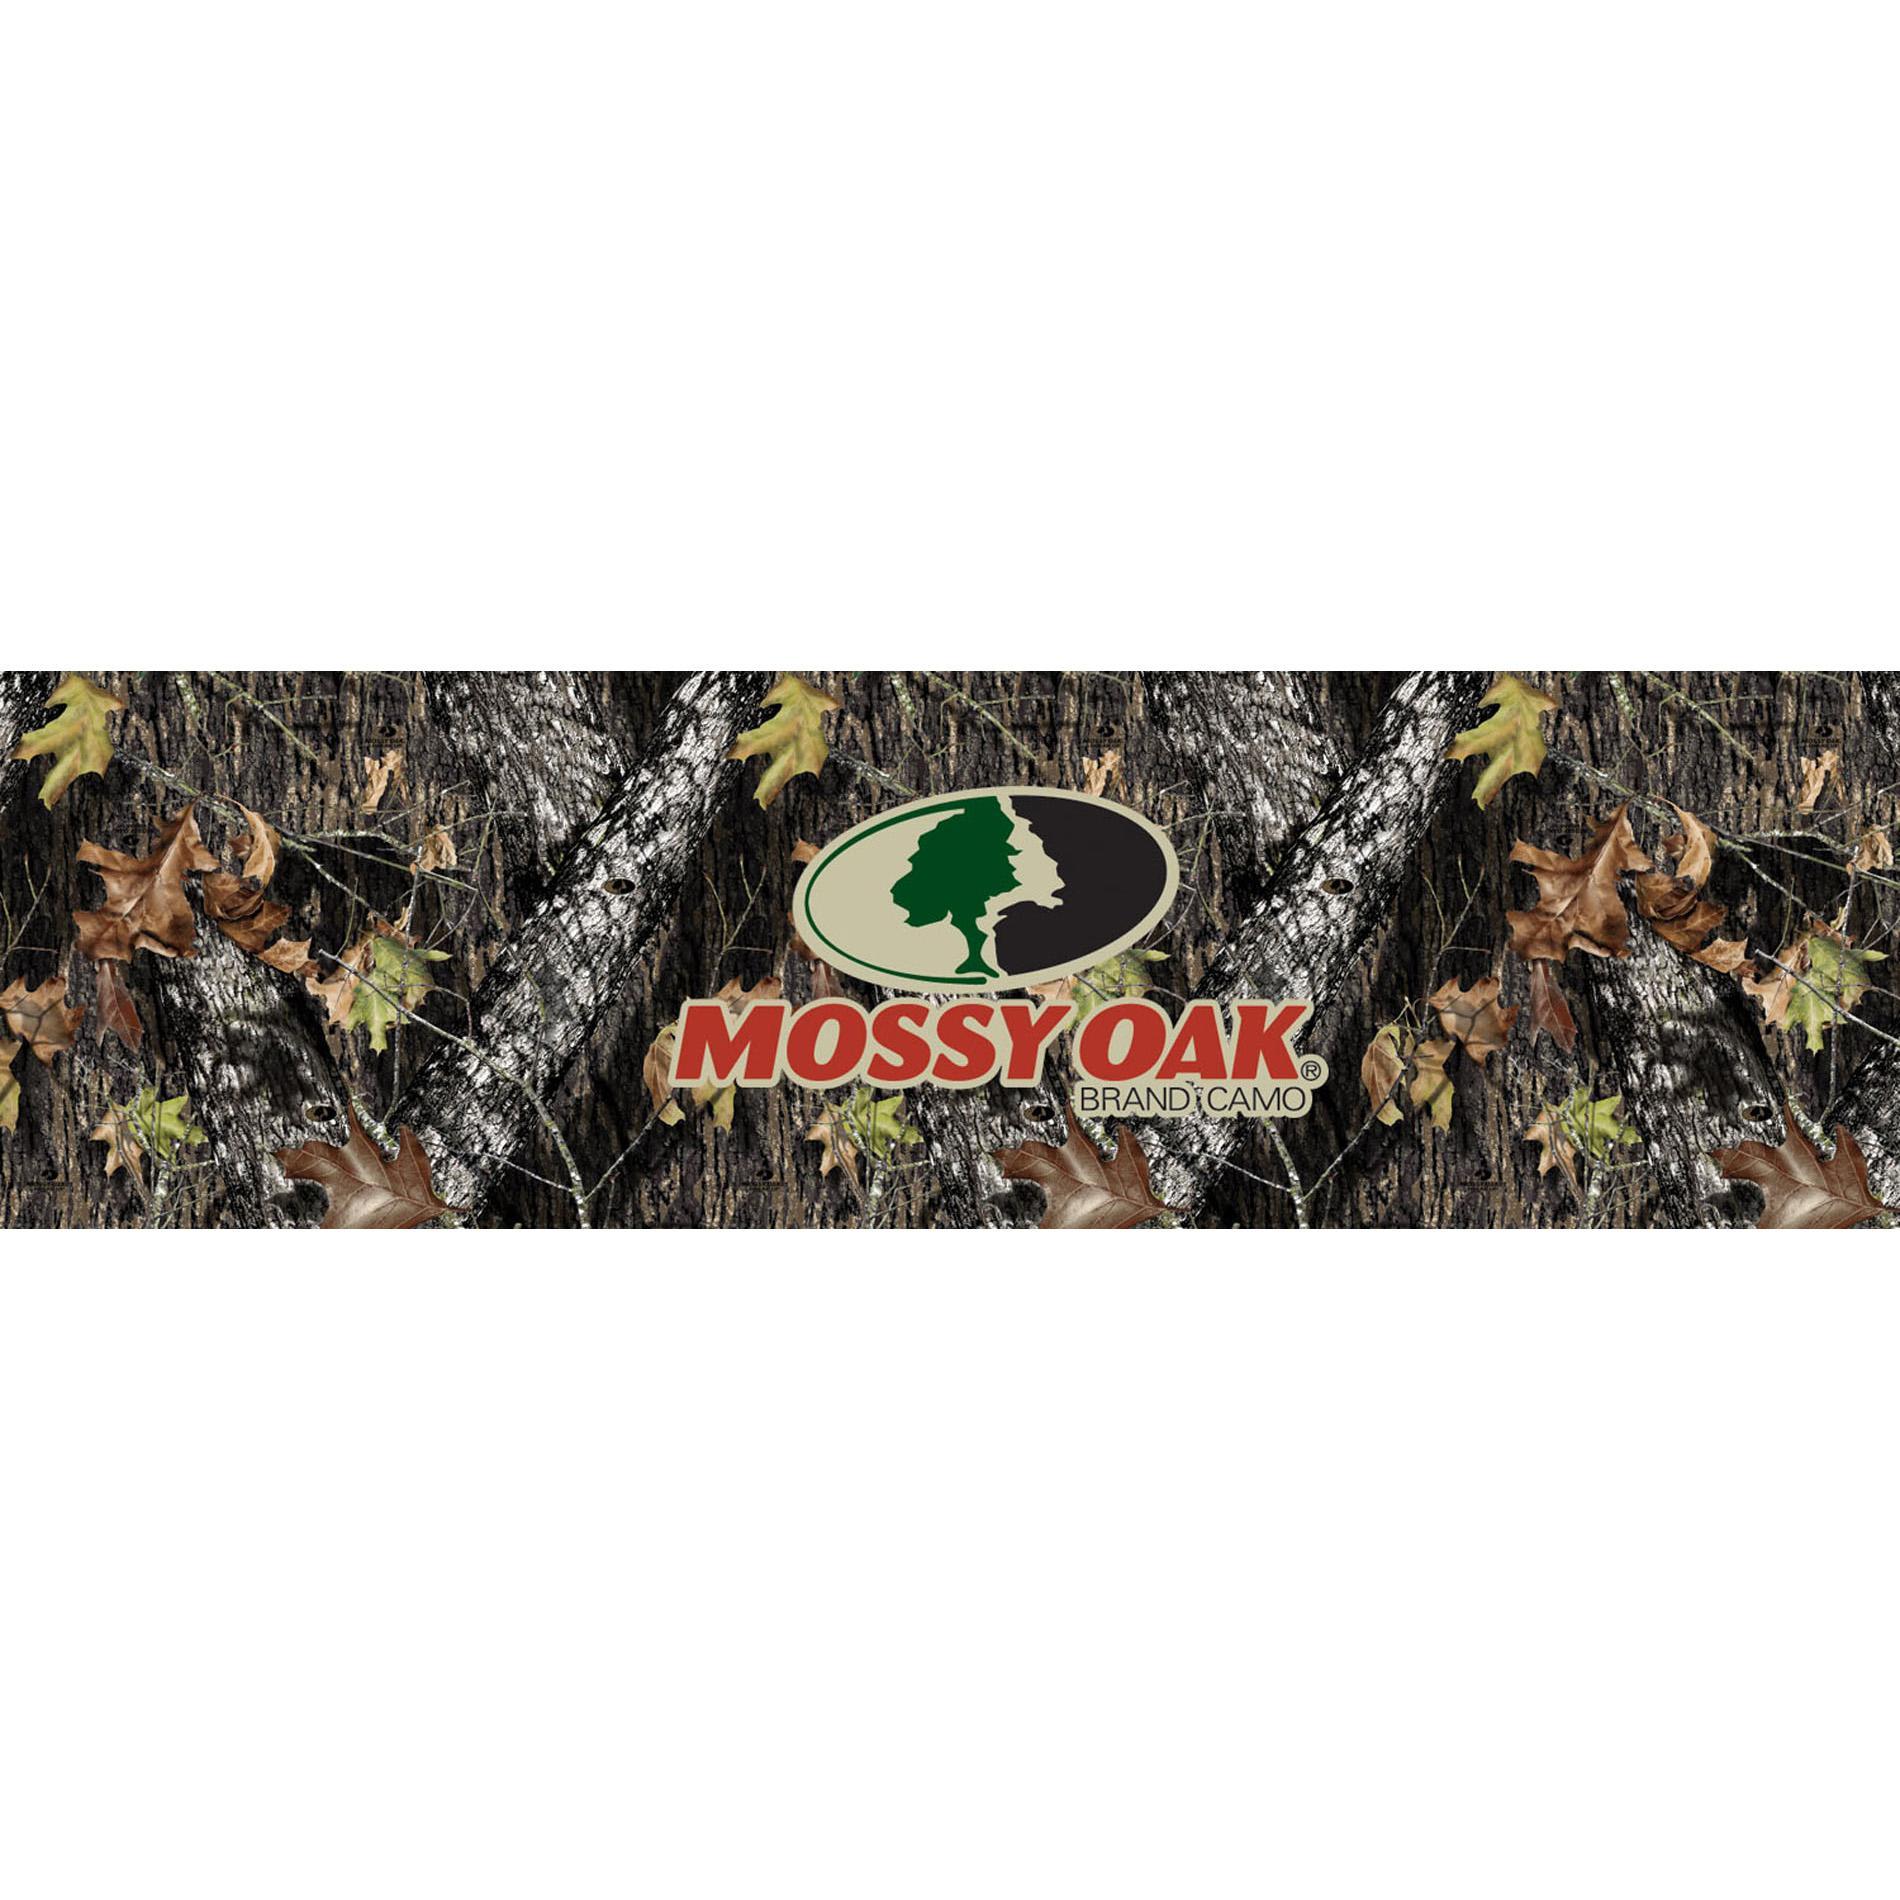 Mossy Oak Camo Rear Window Logo Graphic - Thumbnail 2